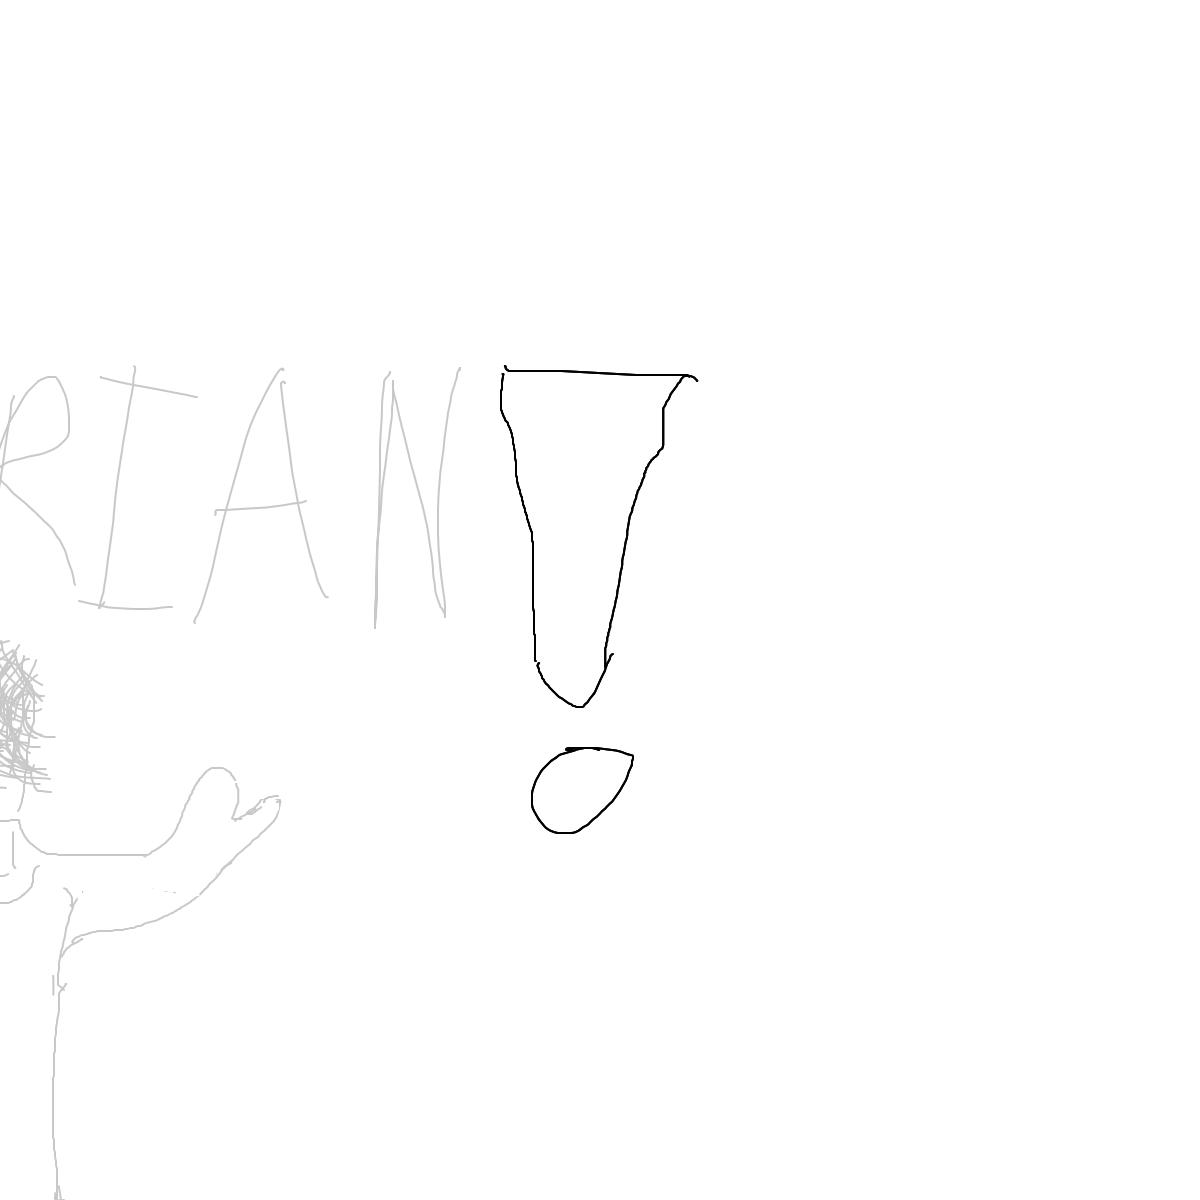 BAAAM drawing#5274 lat:39.9656066894531250lng: -75.1808853149414000